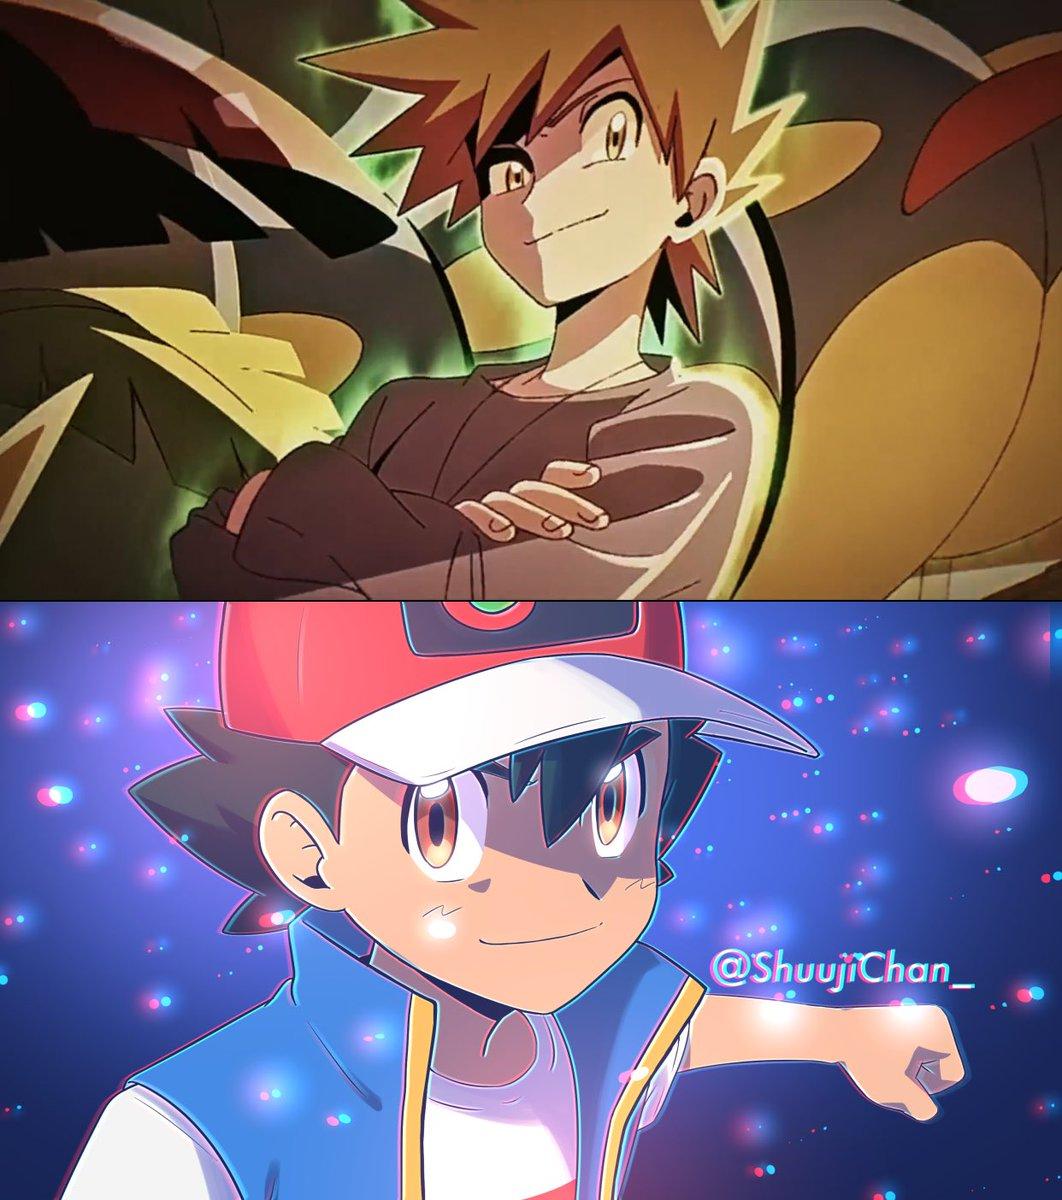 Replying to @ShuujiChan_: Pokemon Journeys x「GOTCHA!」 - Gary vs Ash -  #anipoke (2/2)